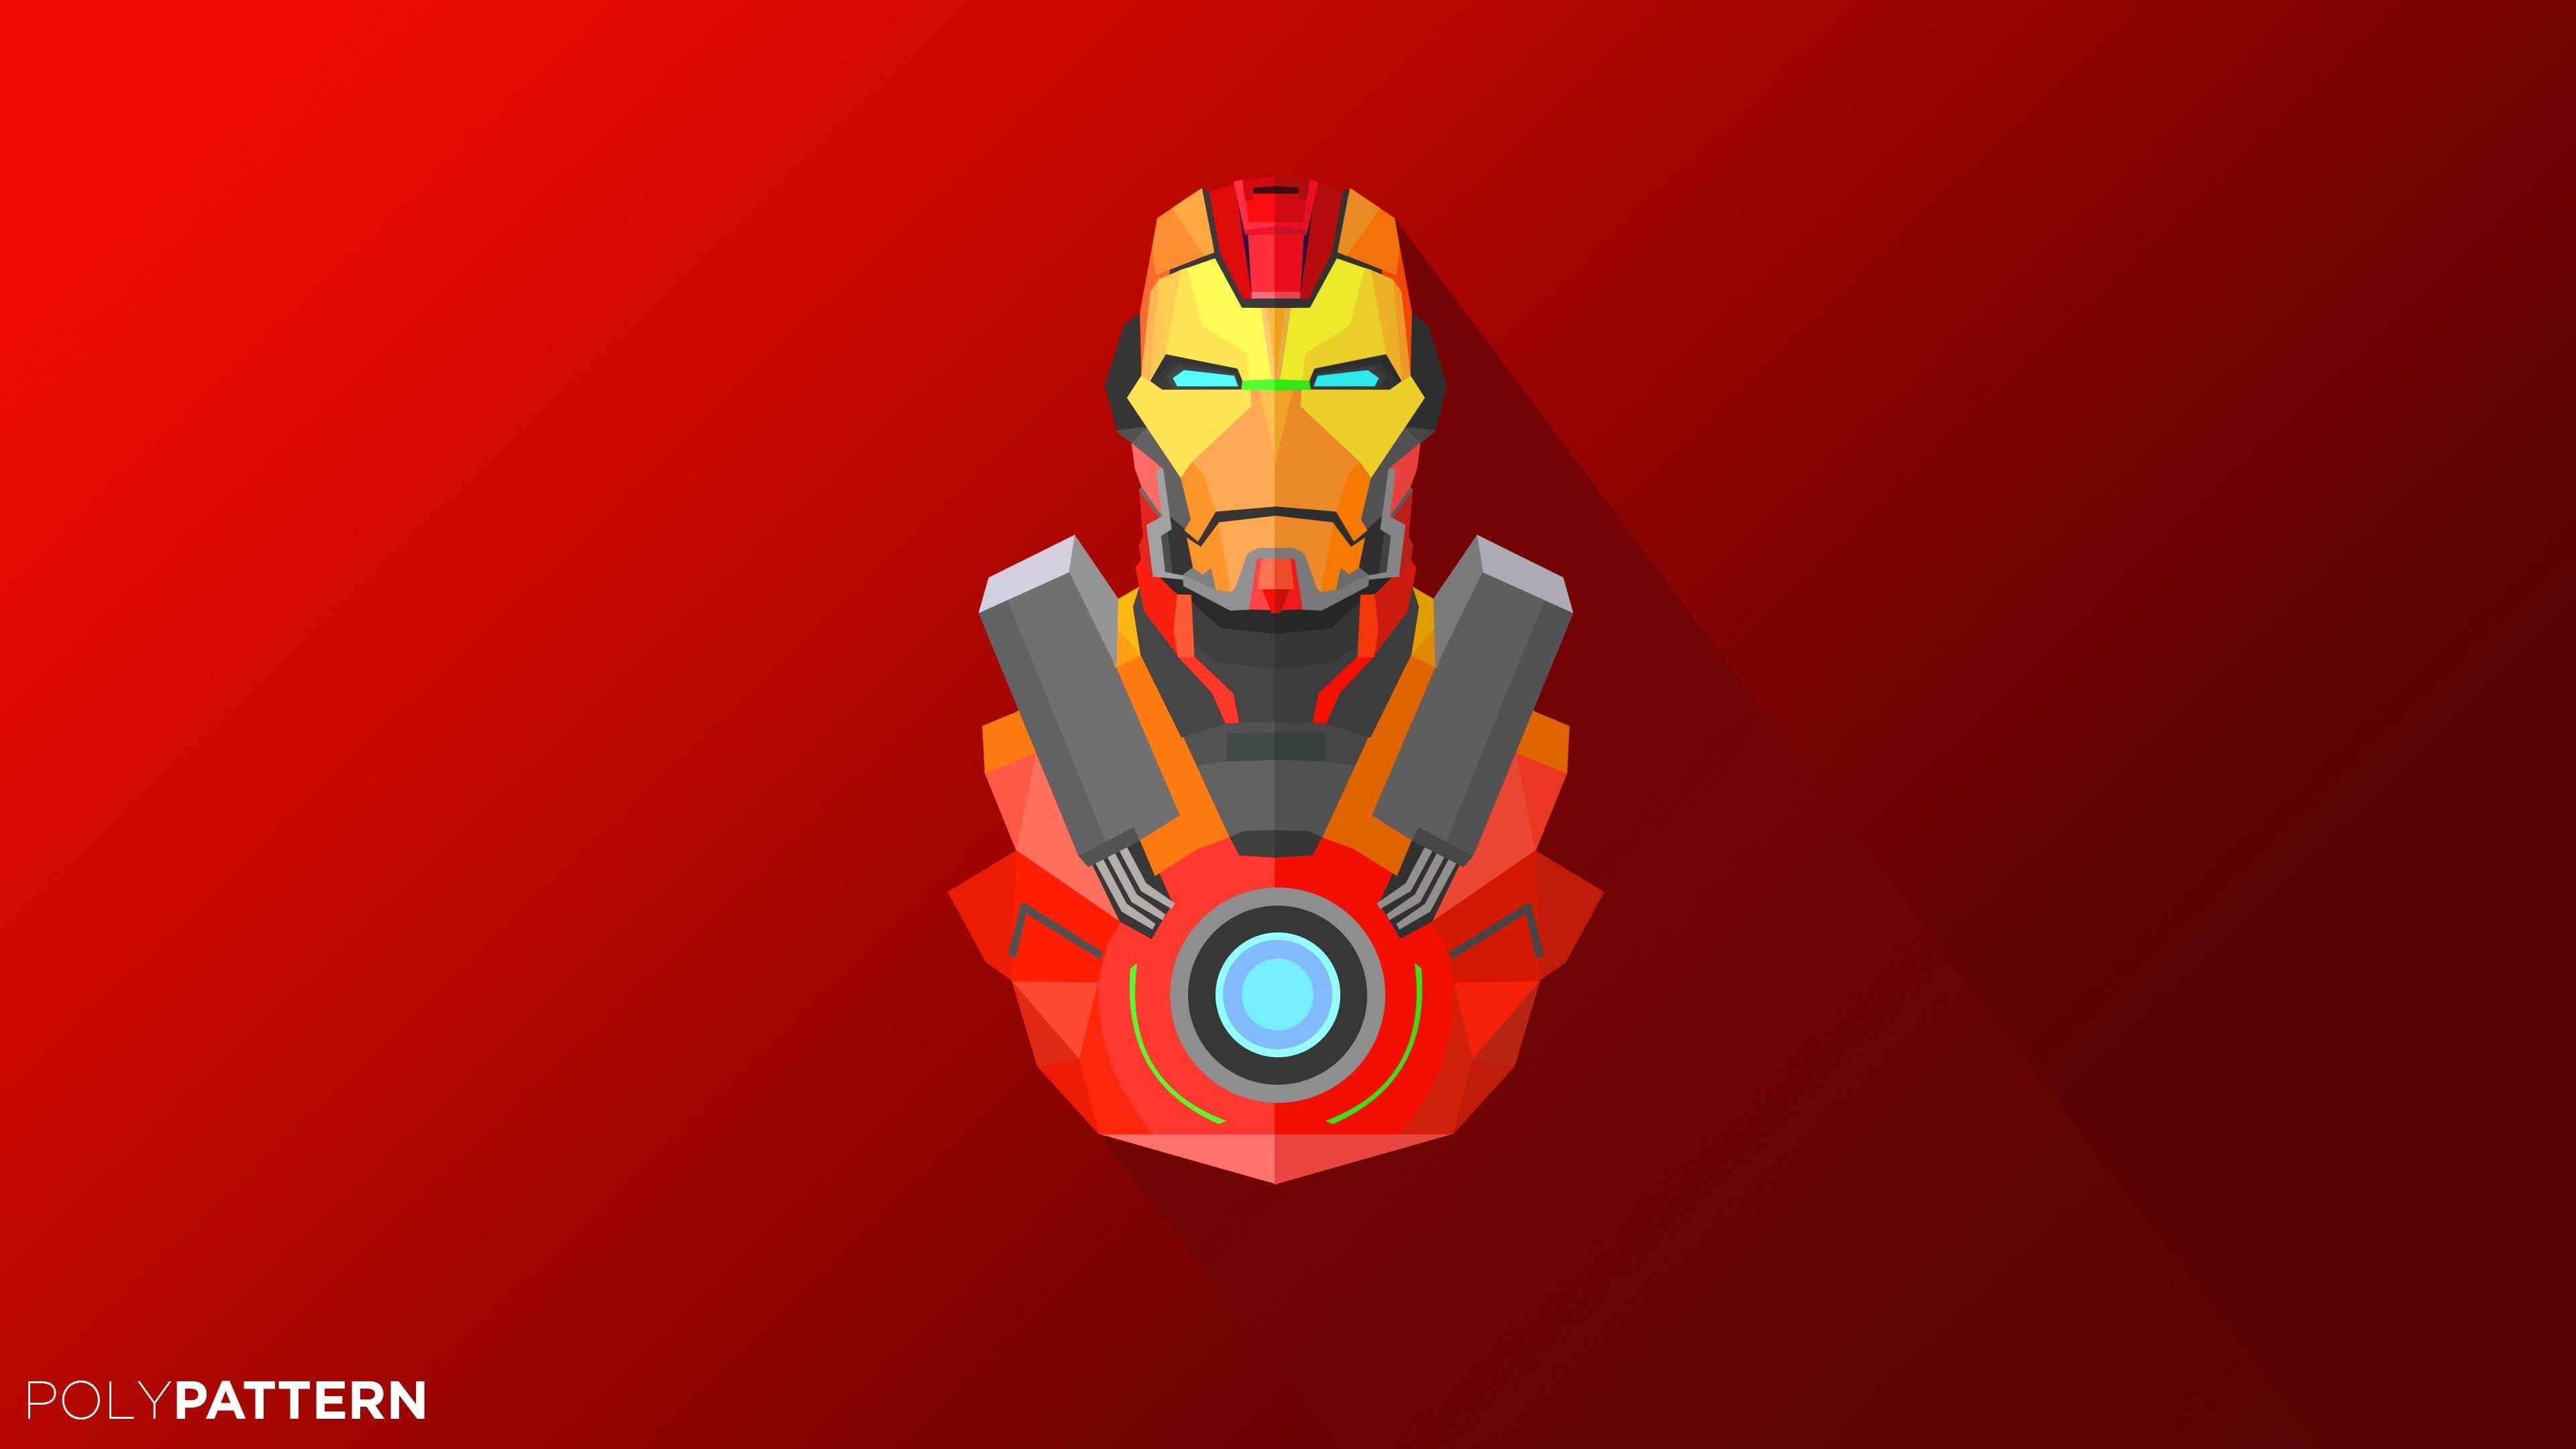 Motorola Logo Full Hd Wallpaper Iron Man Heartbreaker 4k Wallpaper